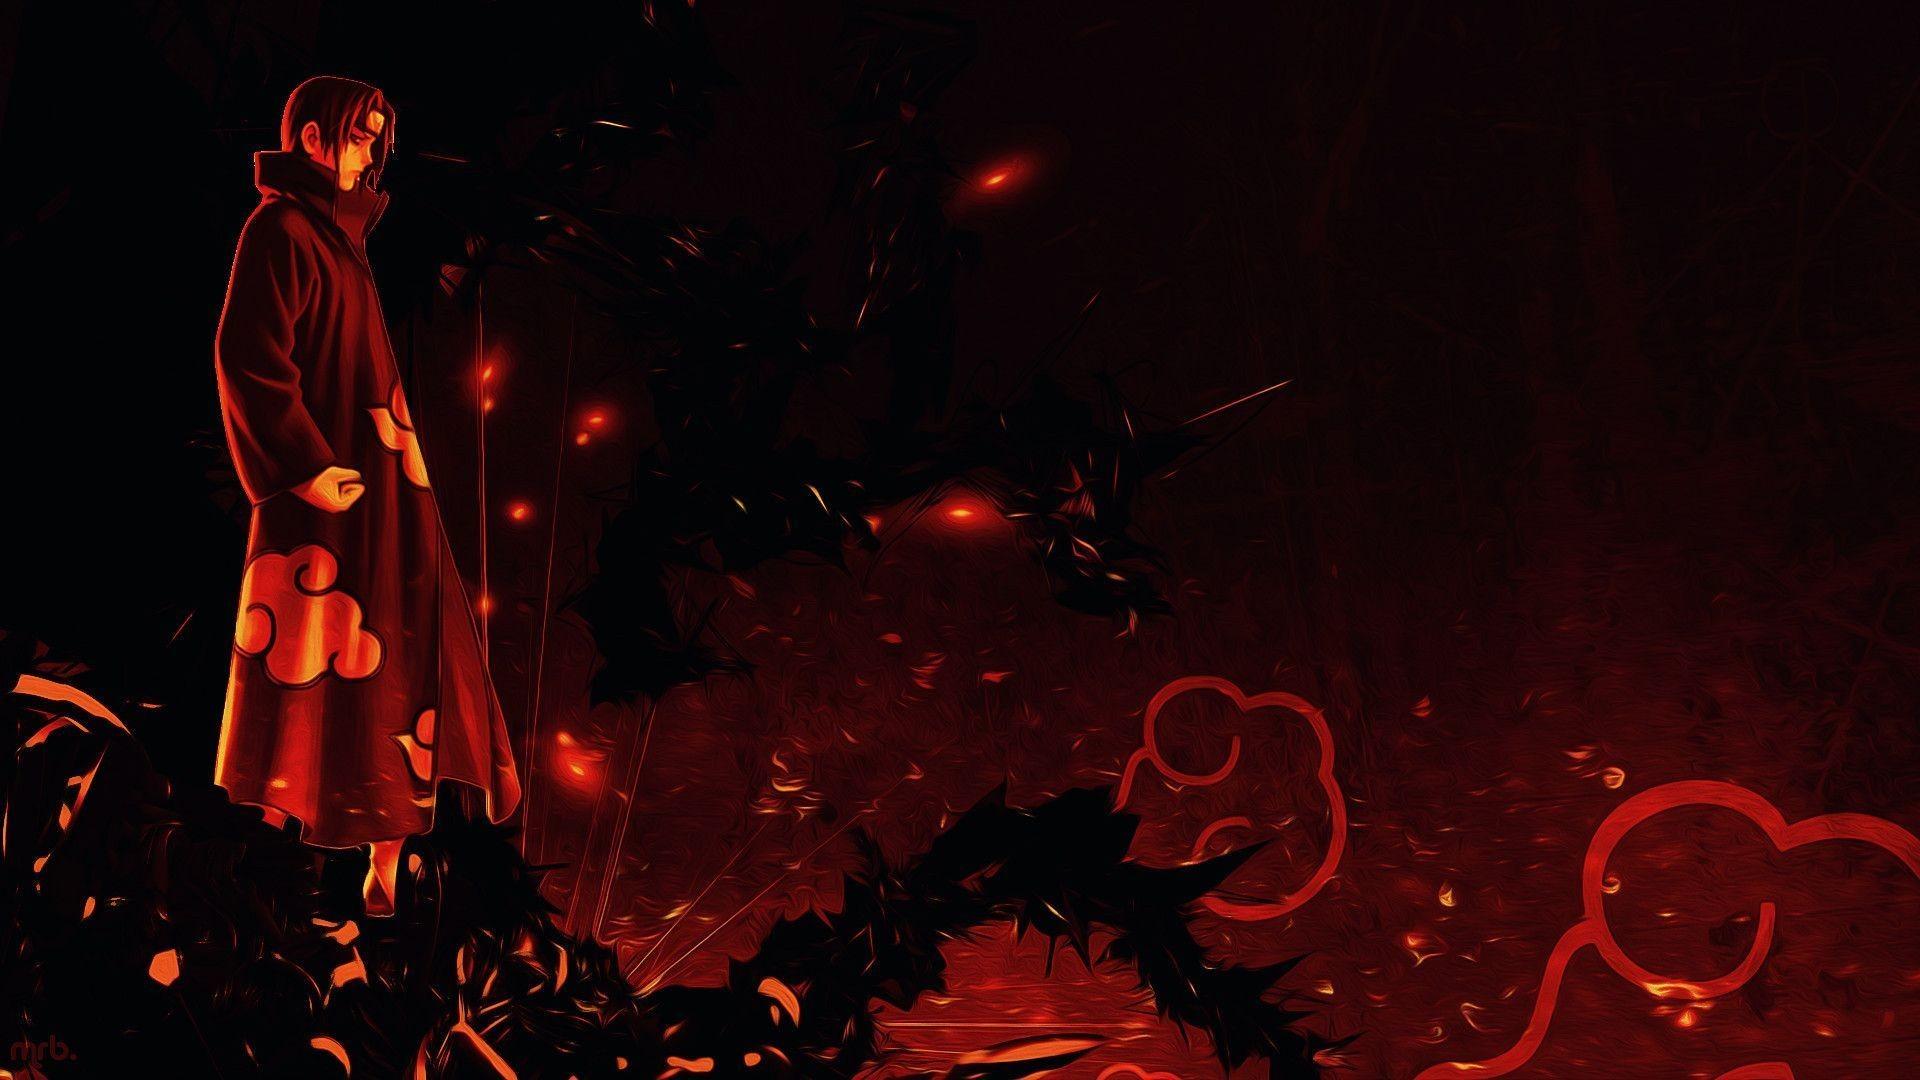 Itachi Amaterasu Wallpaper Hd